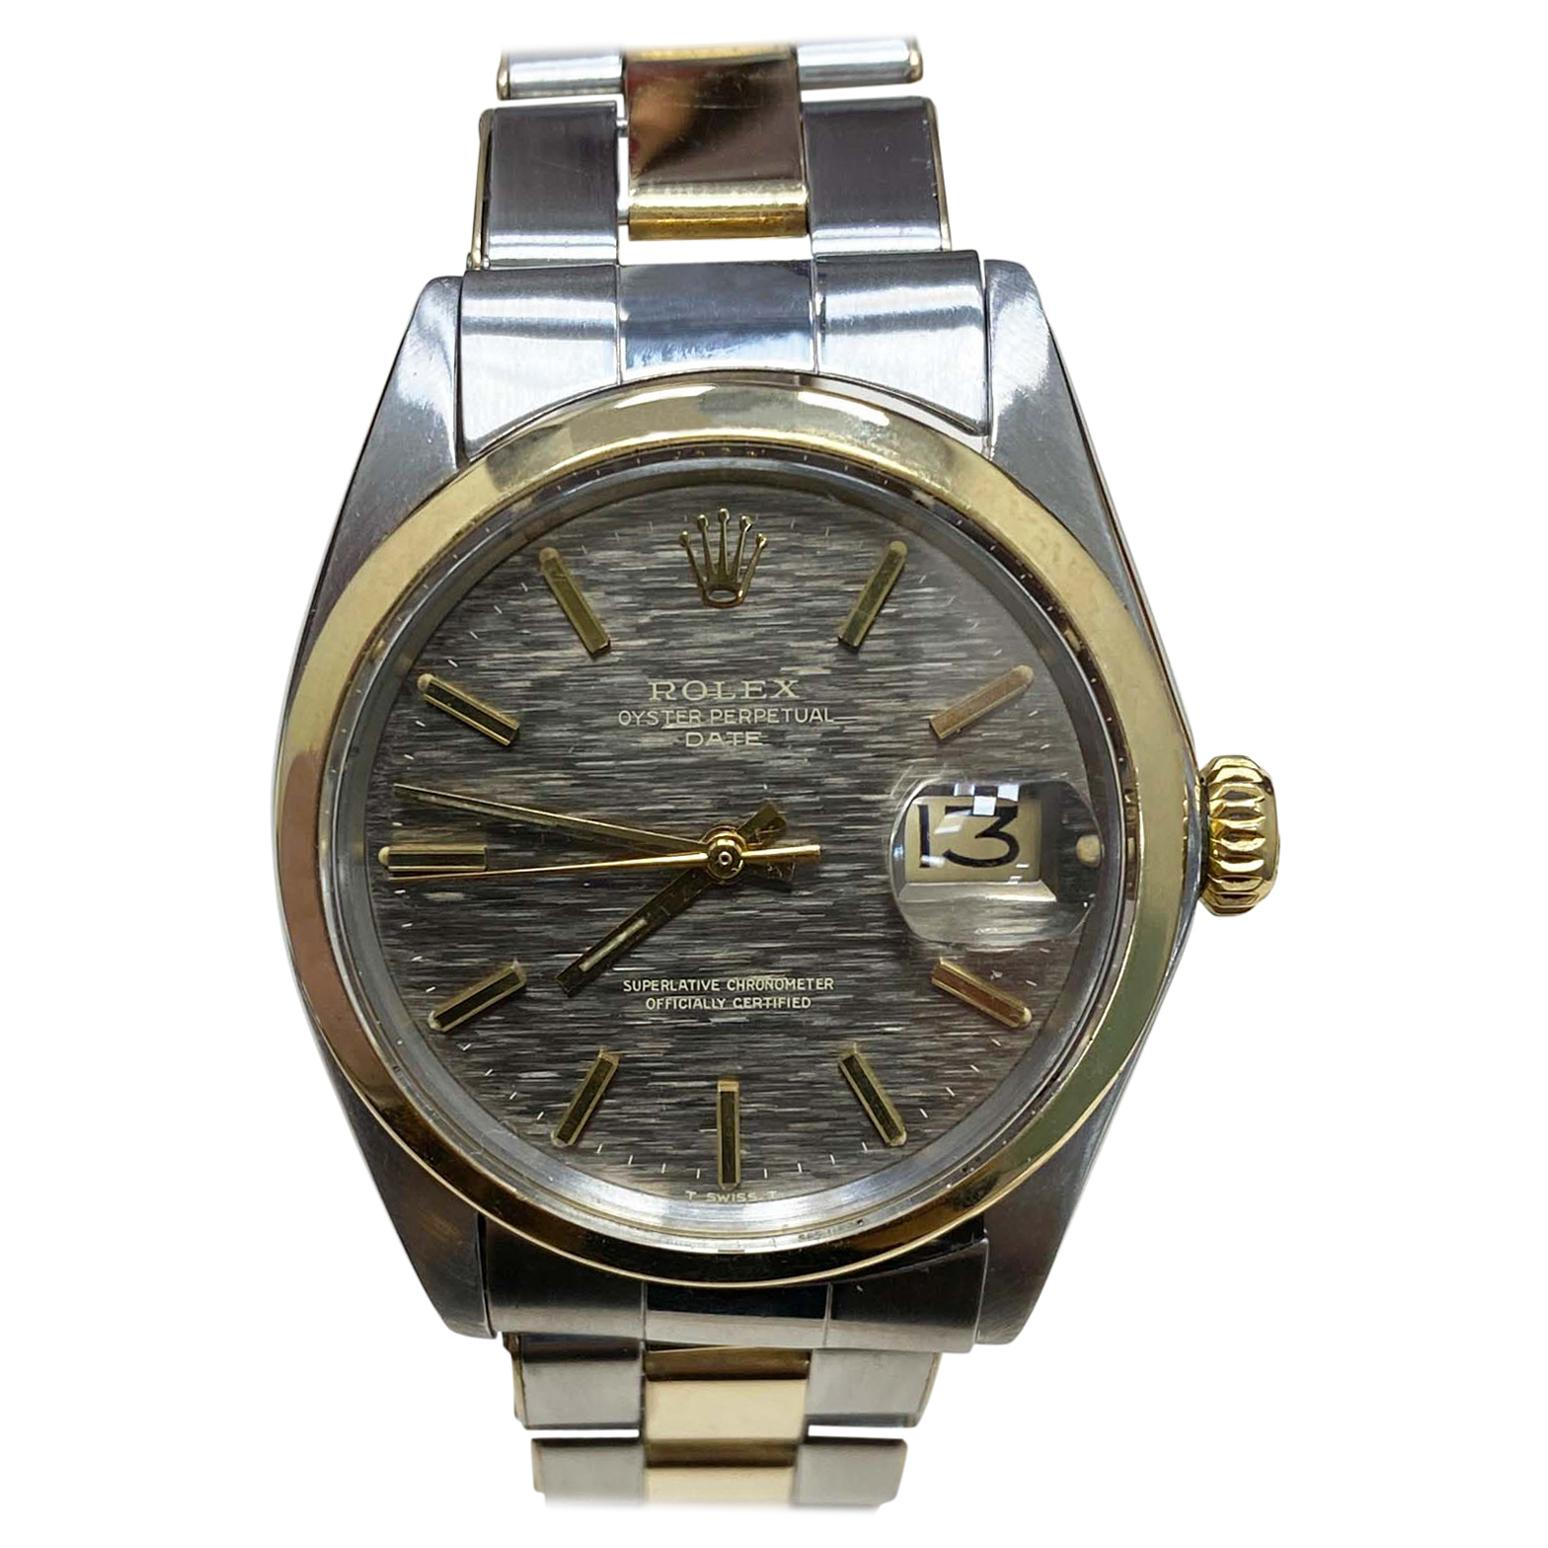 Rolex Date 1500 14 Karat Yellow Gold Stainless Steel